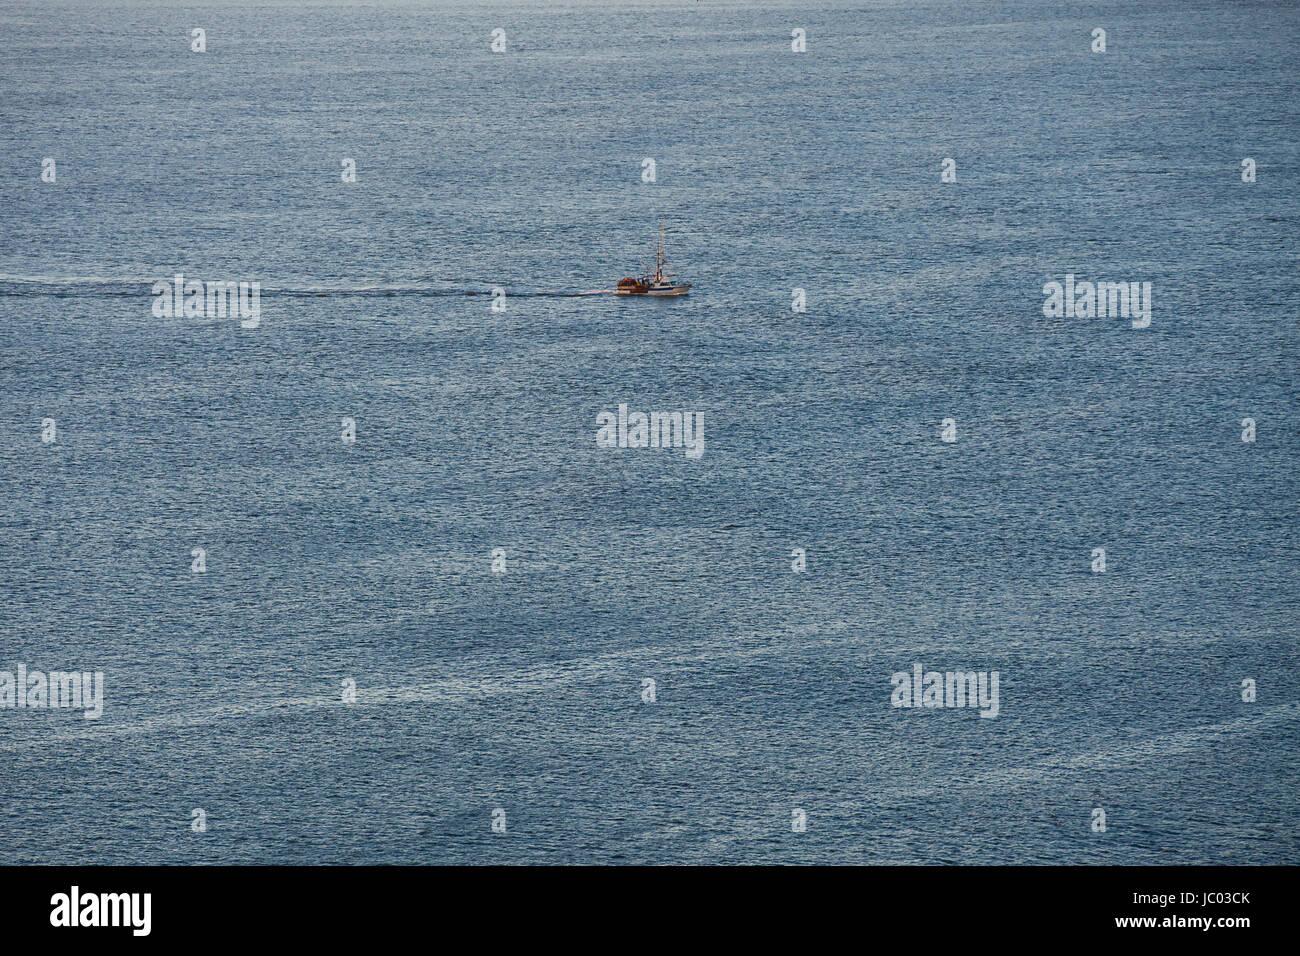 Crab fishing boat on open water (ocean water) - San Francisco, California USA - Stock Image